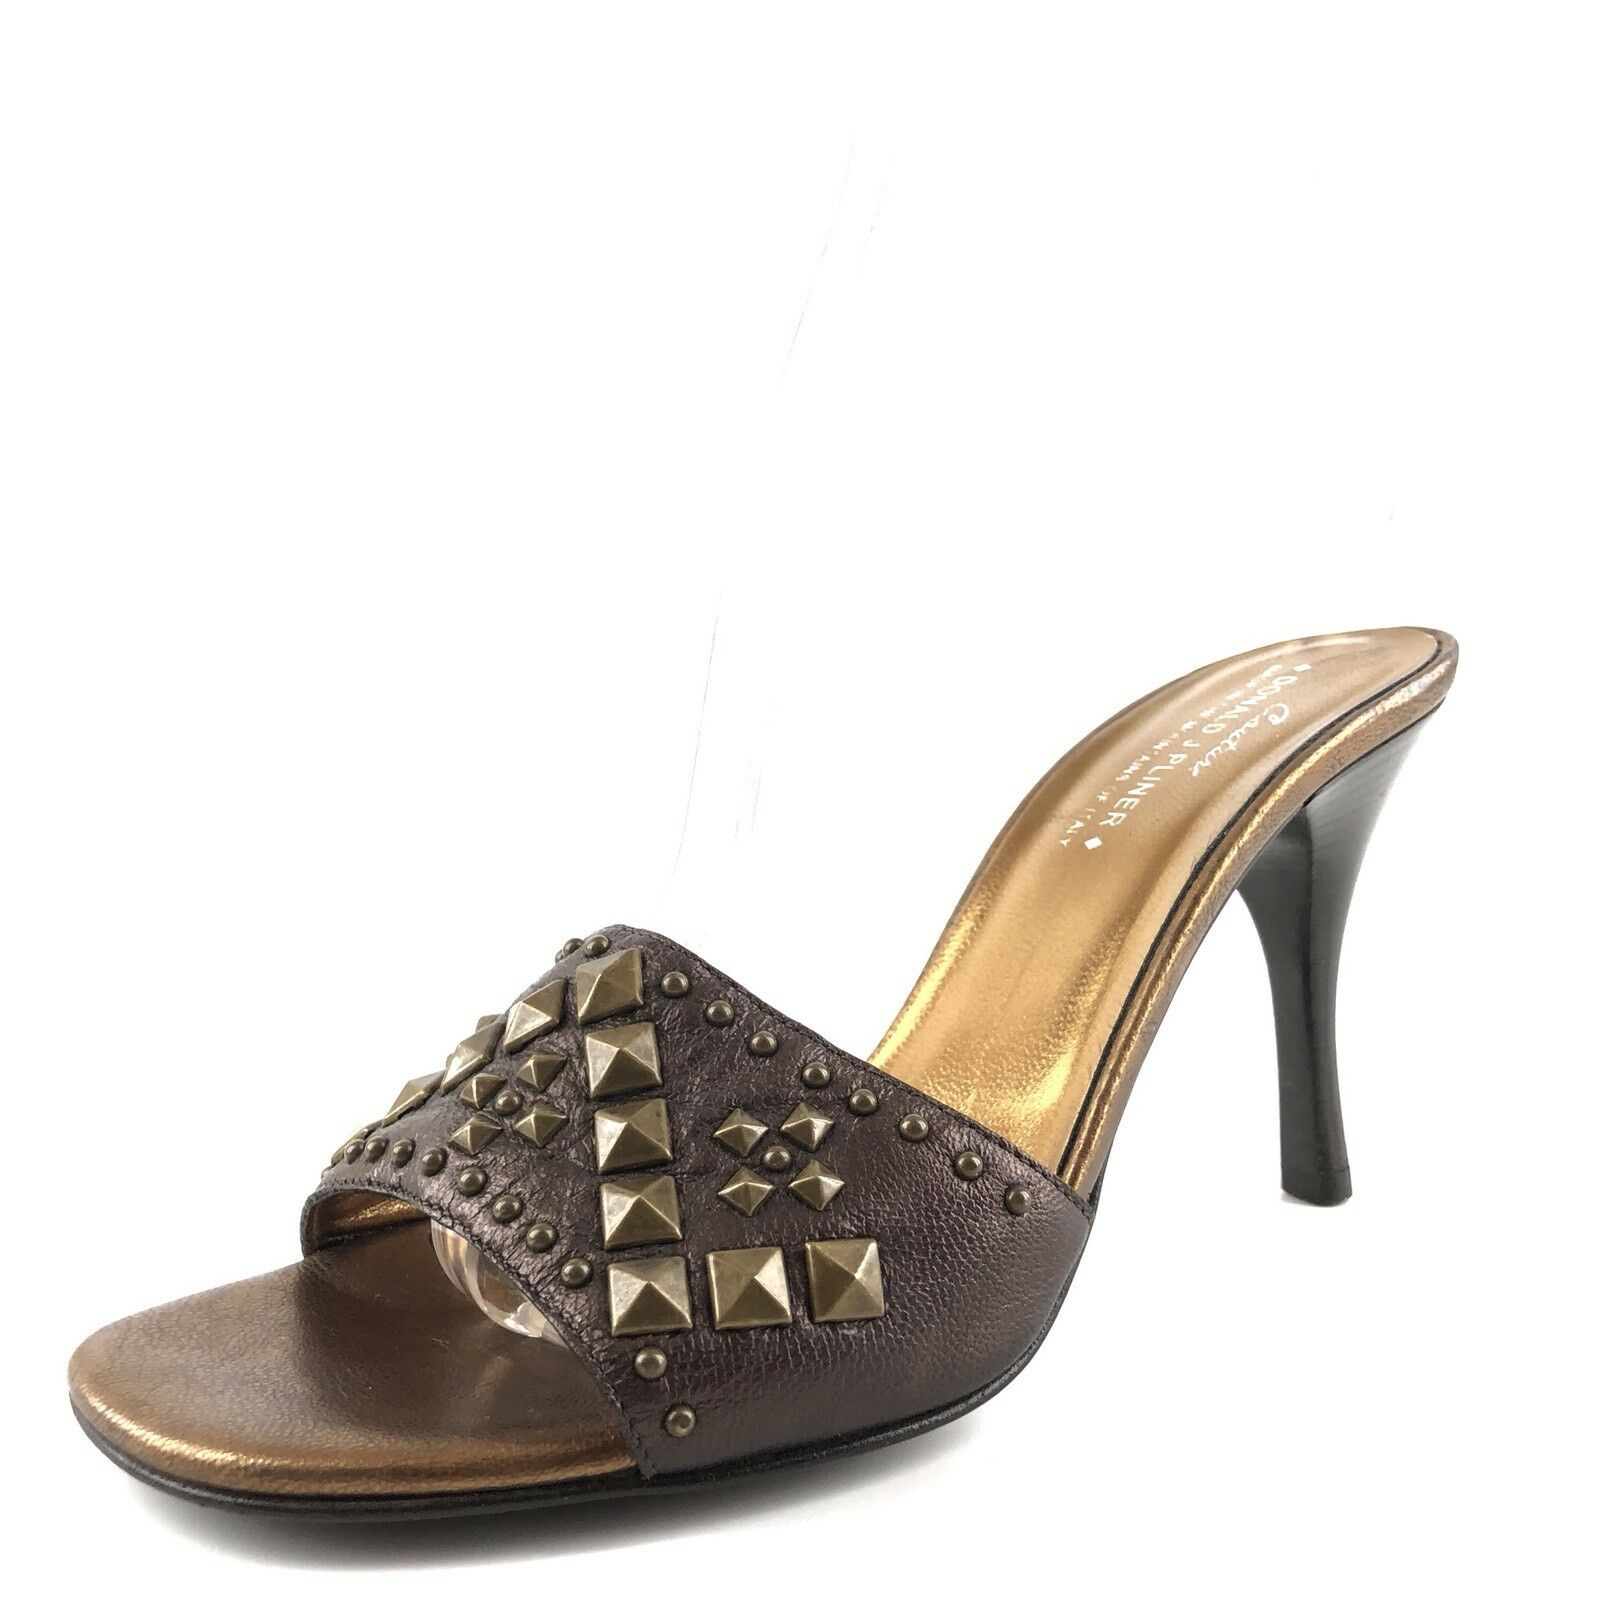 Donald J Pliner Toe Nievo braun Leather Studded Open Toe Pliner Sandals damen Größe 7.5 M  2cd18b